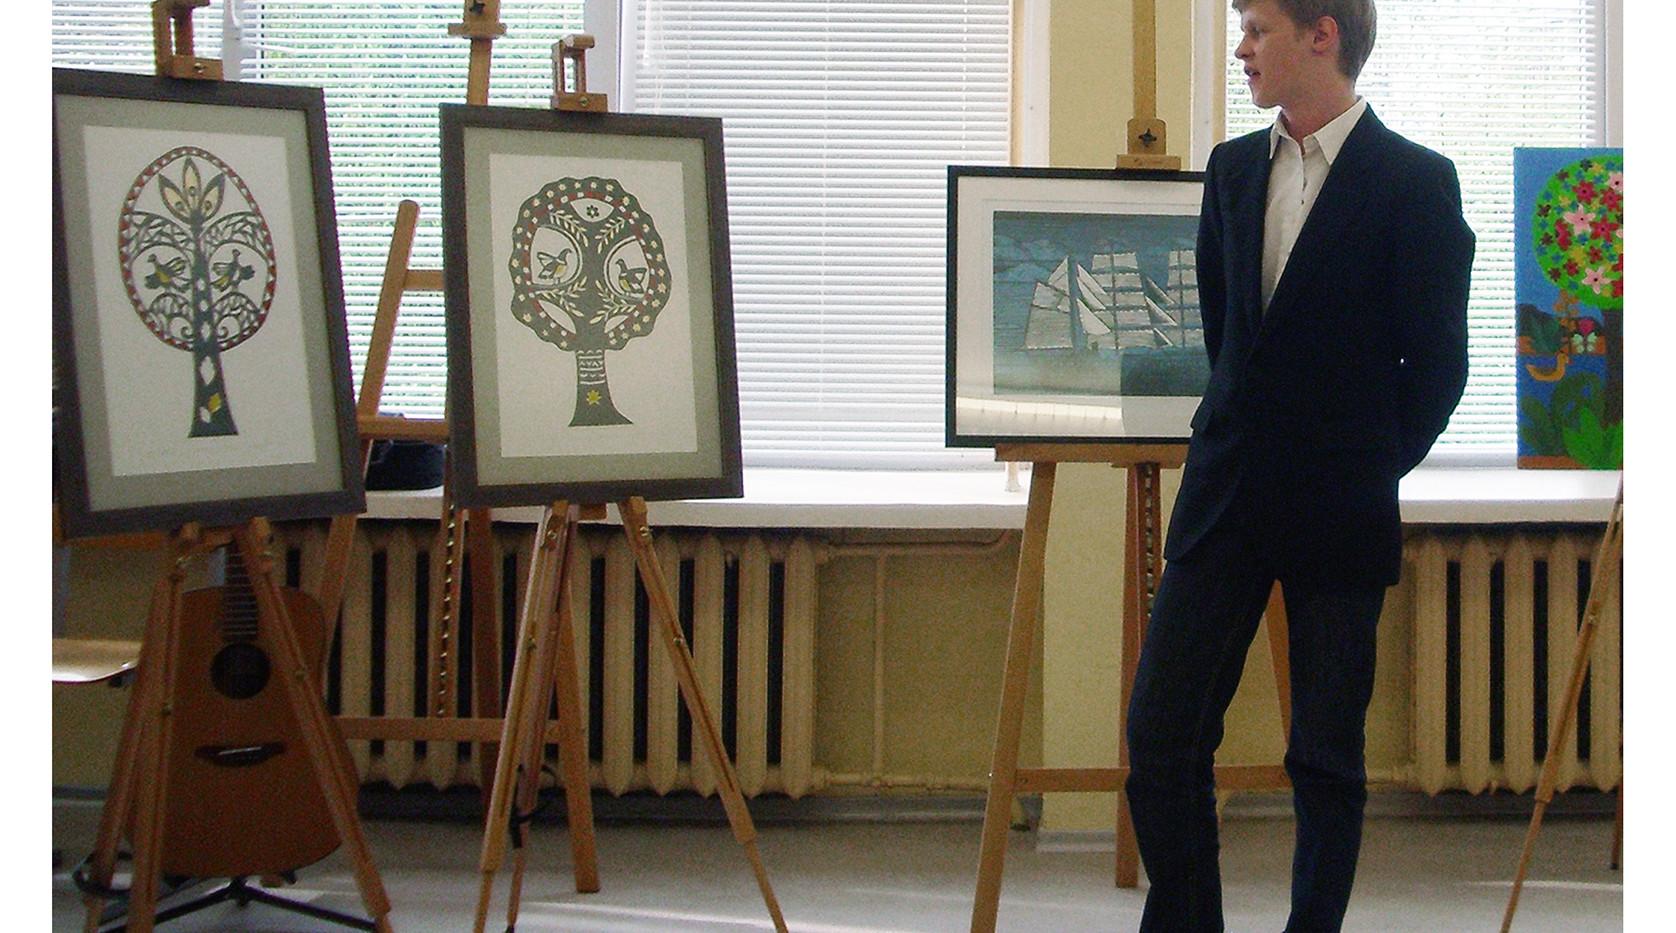 Presentation of the art exam